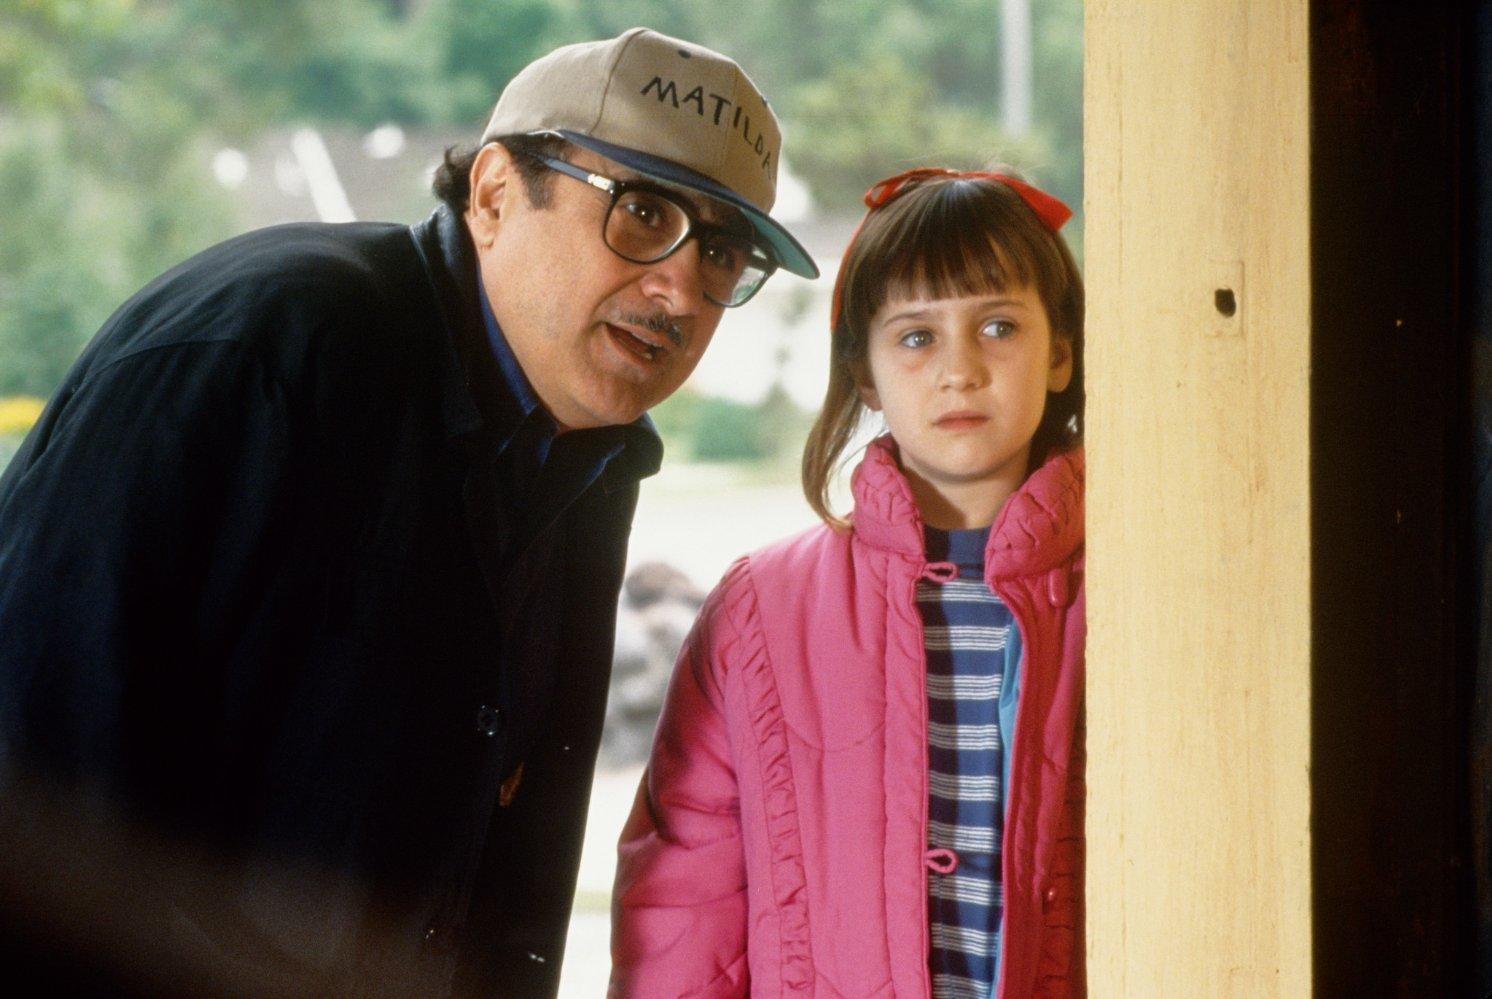 Danny DeVito and Mara Wilson on Matilda film set